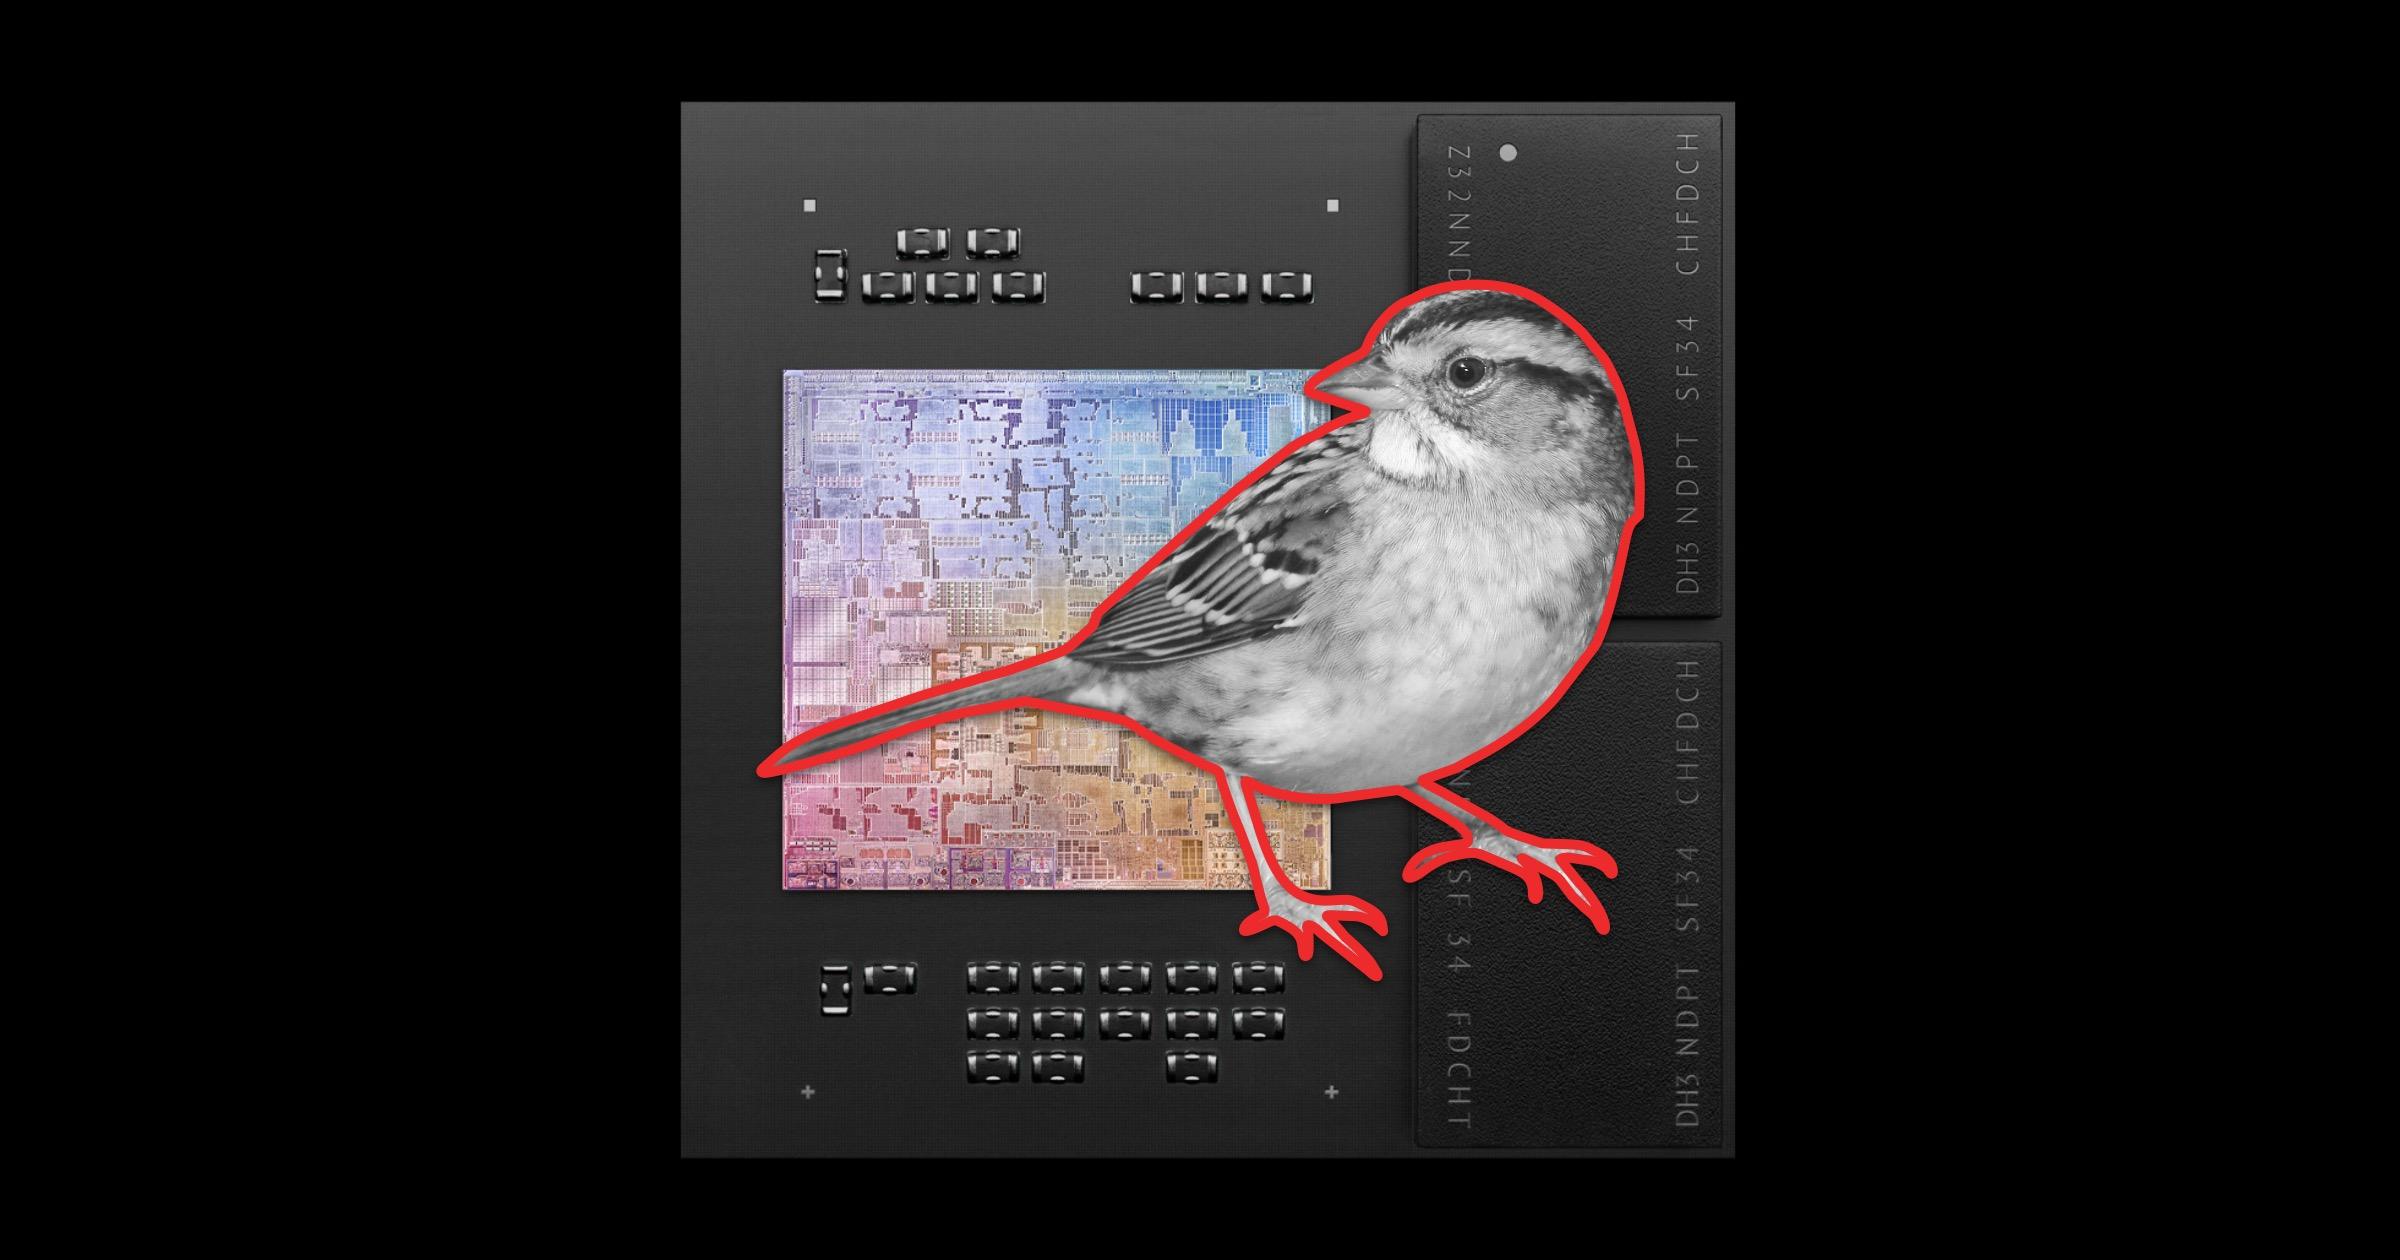 Silver sparrow malware